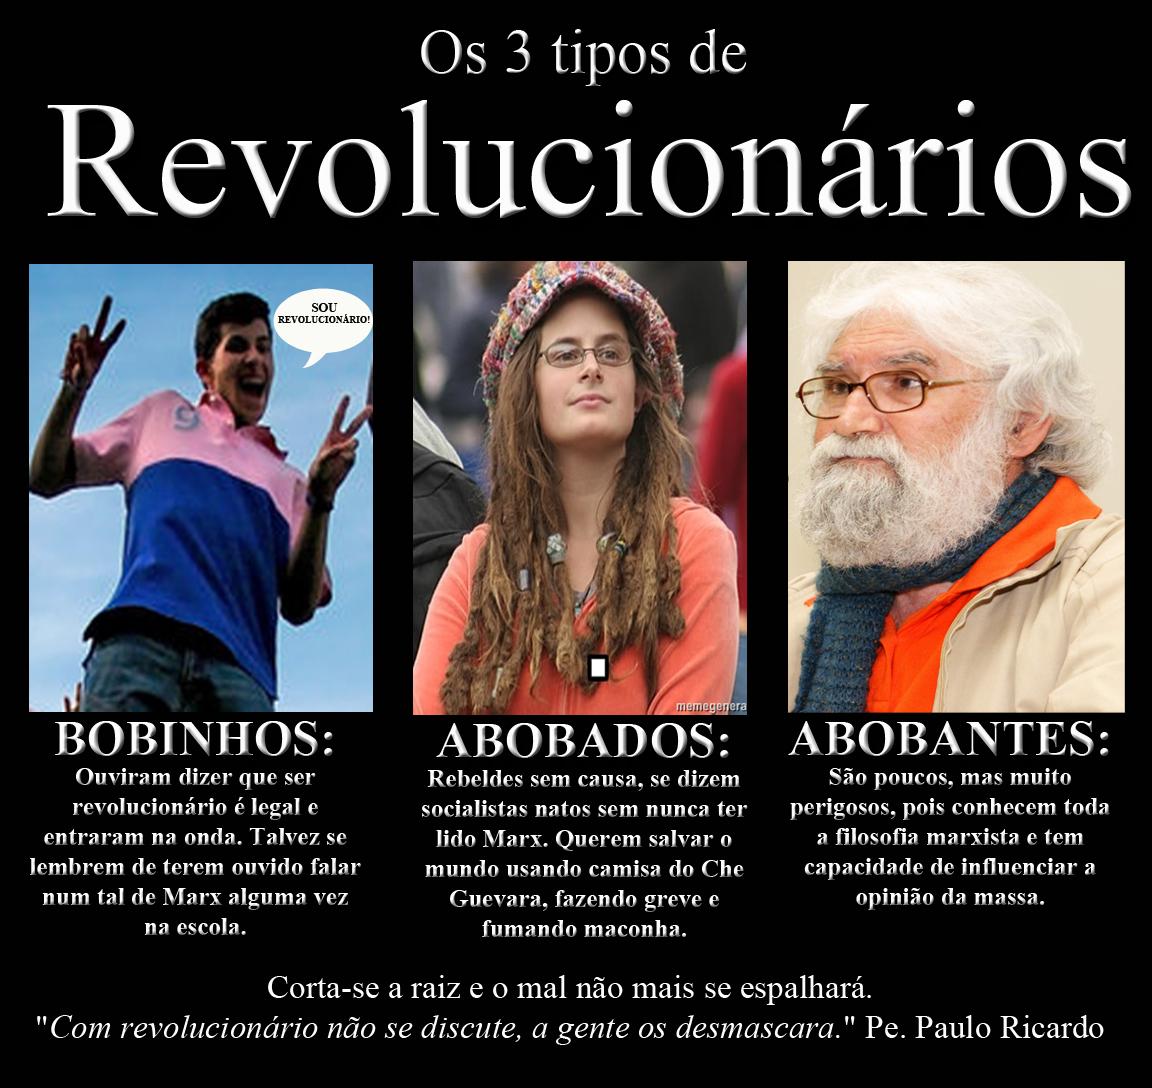 mater dei  memes cat u00f3licos  contra revolu u00e7 u00e3o